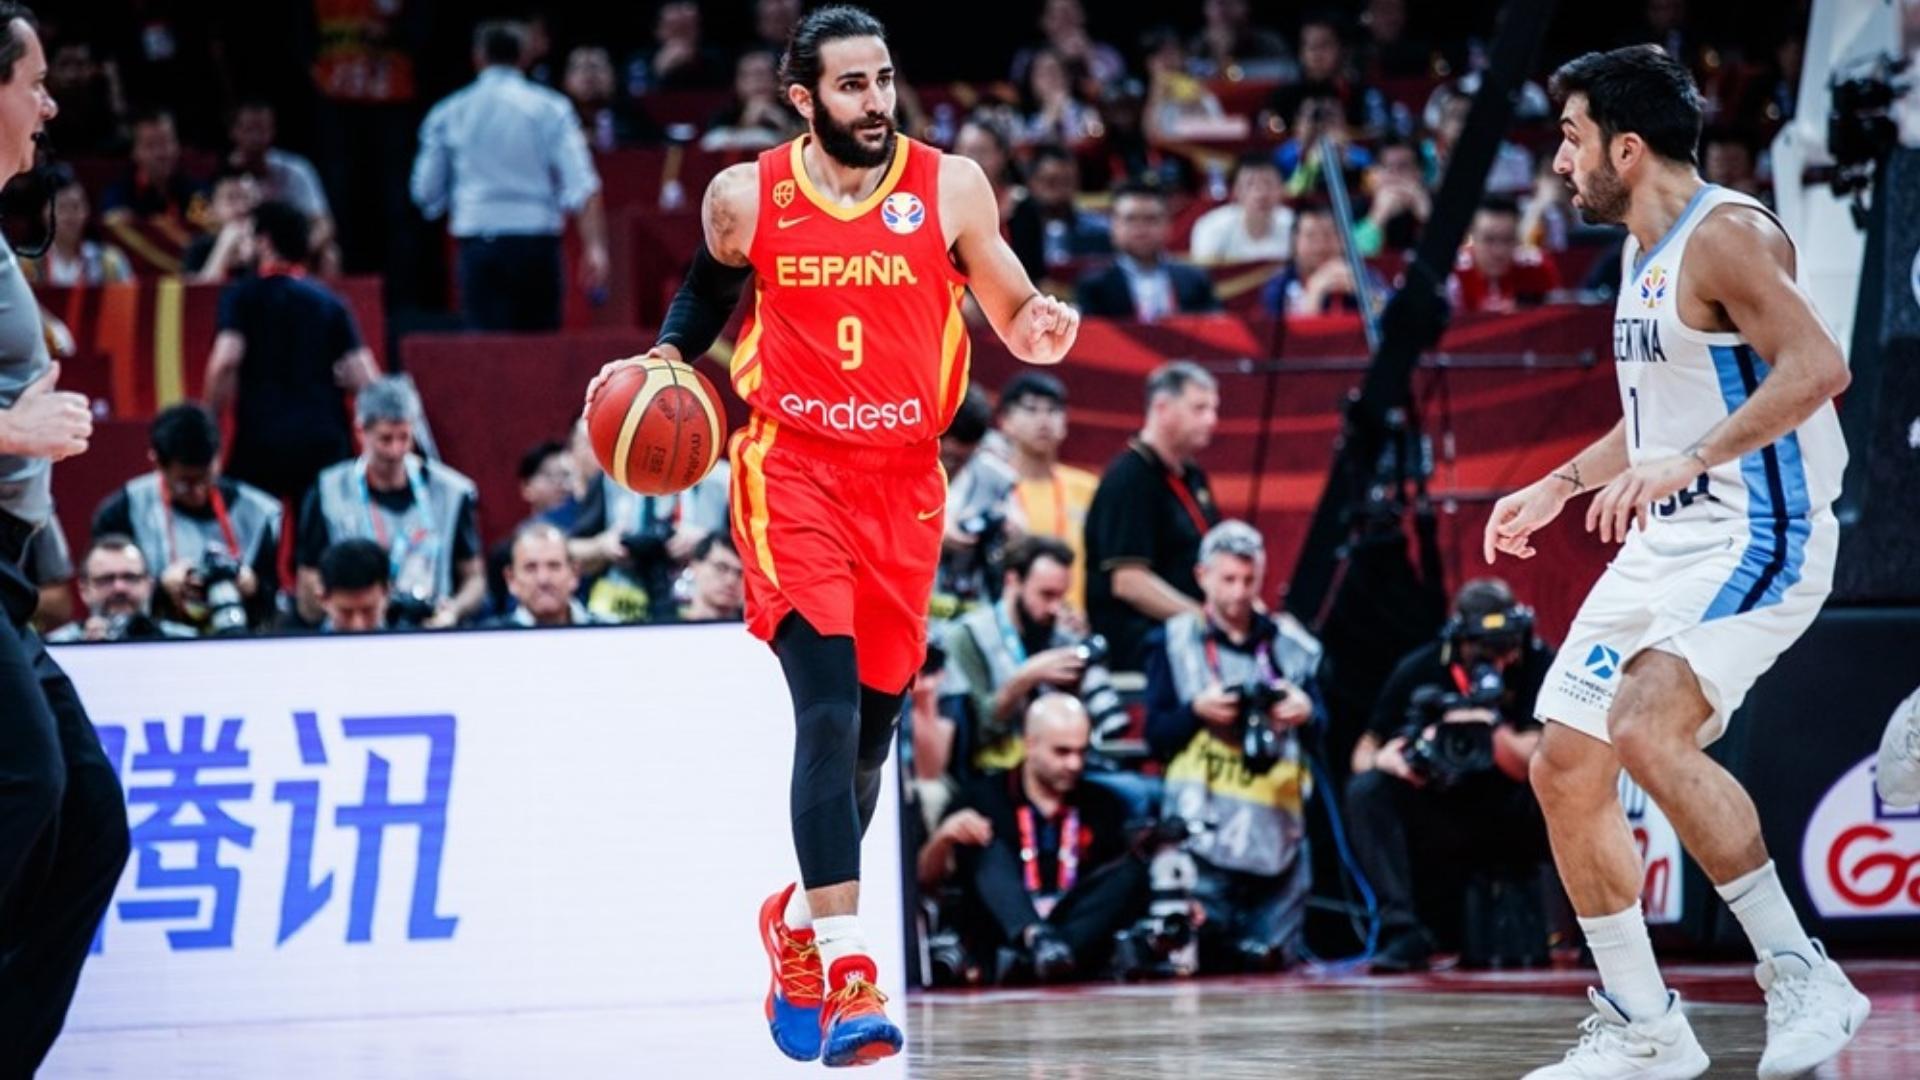 Mundial De Baloncesto 2019: Ricky Rubio, MVP Del Mundial